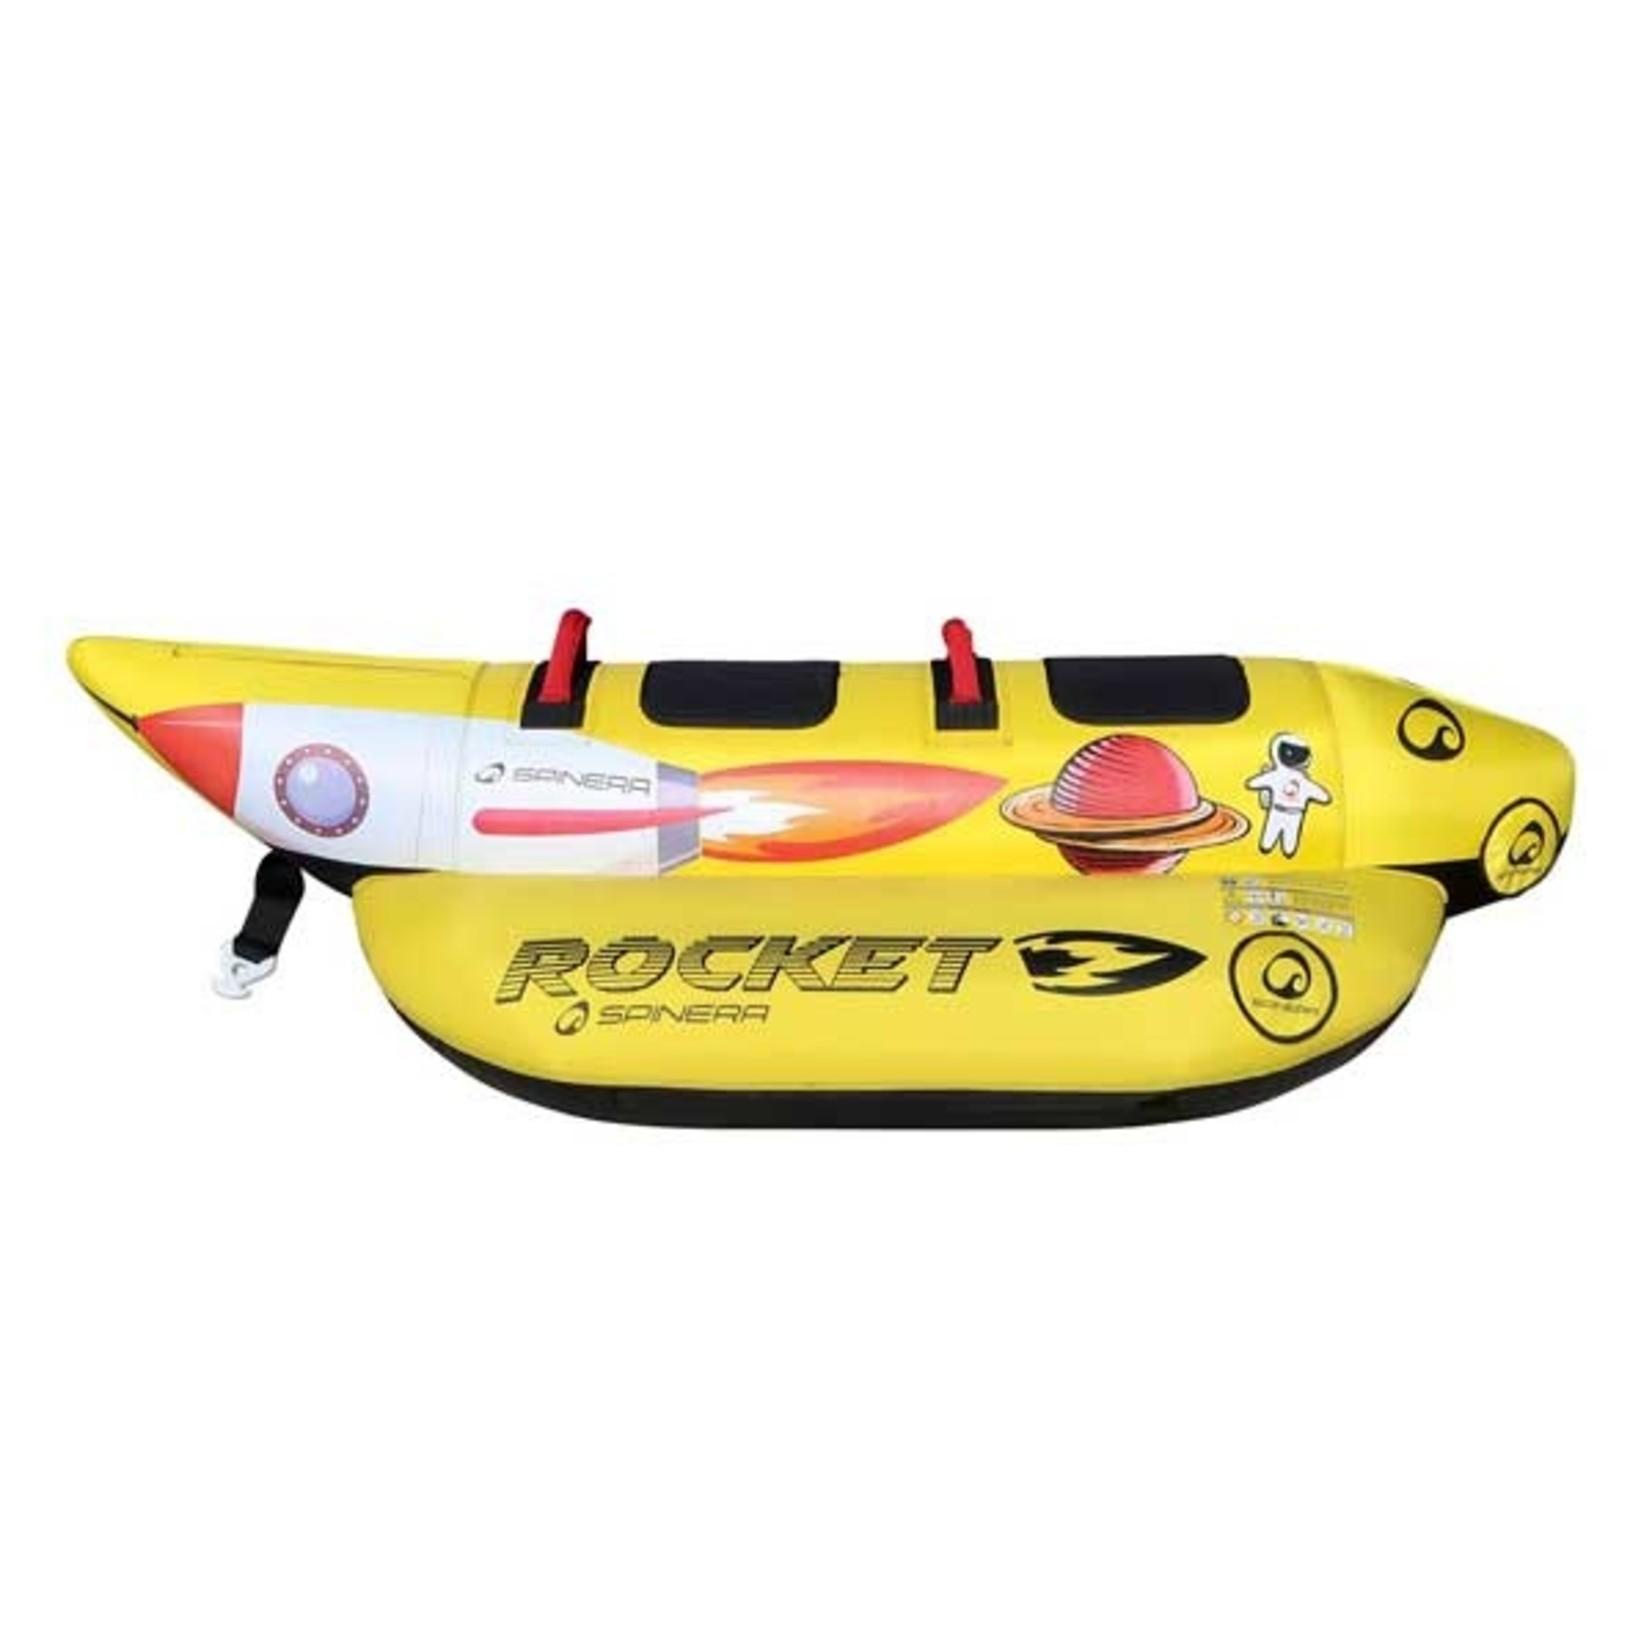 Rocket 2 - Tweepersoonsbanaan